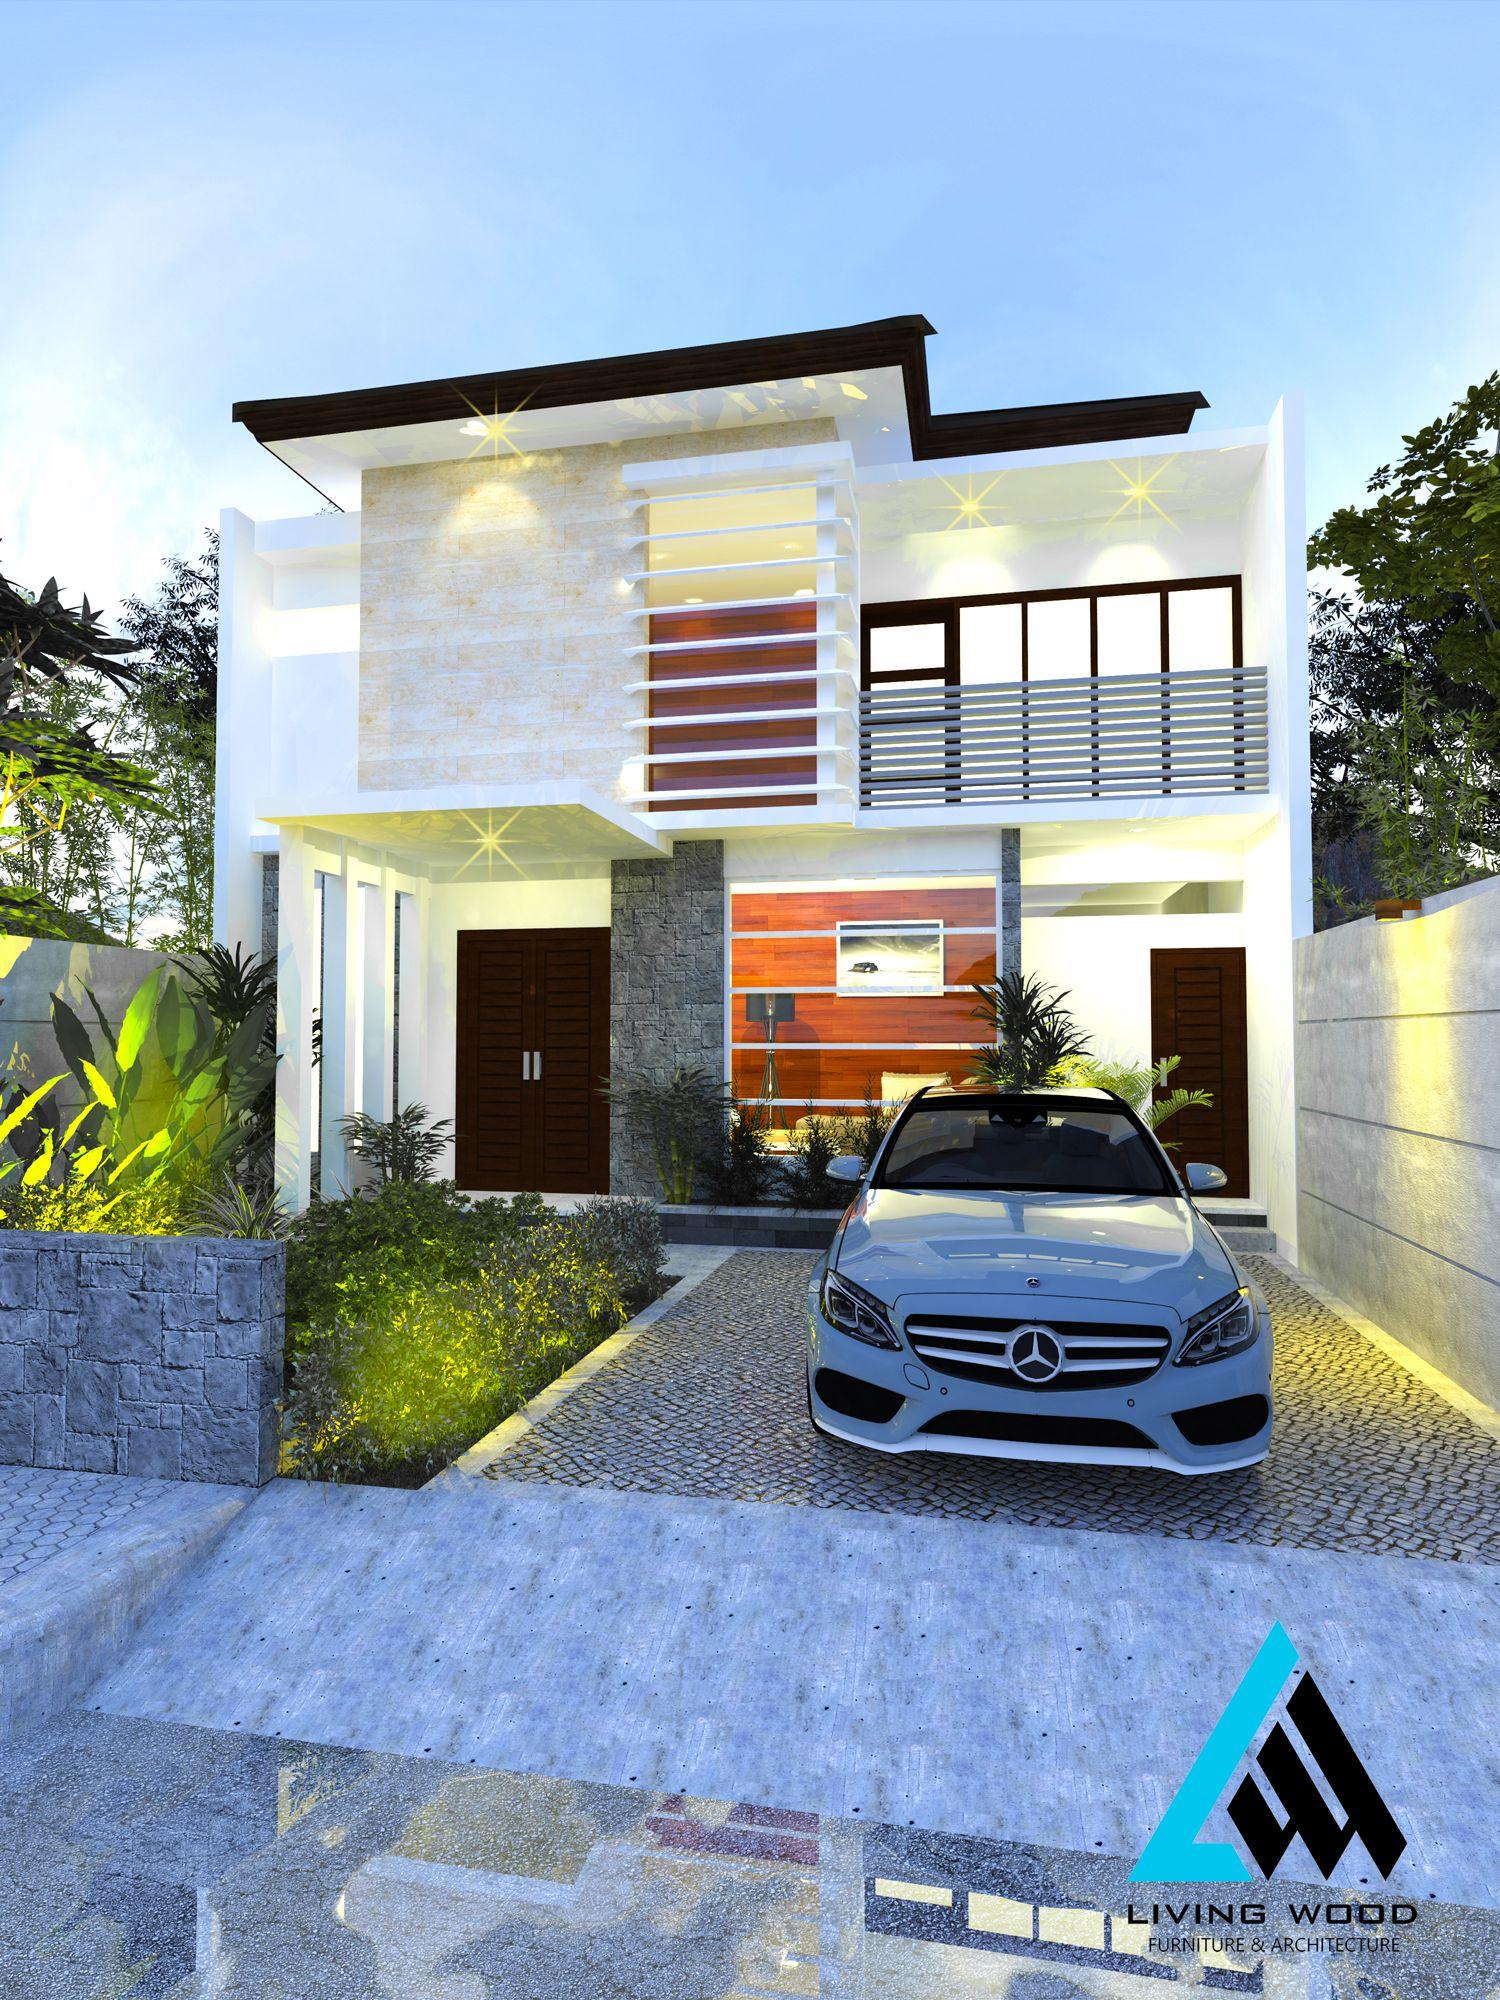 Medium house by living wood studio architecture building facade indonesia bali design project also rh za pinterest